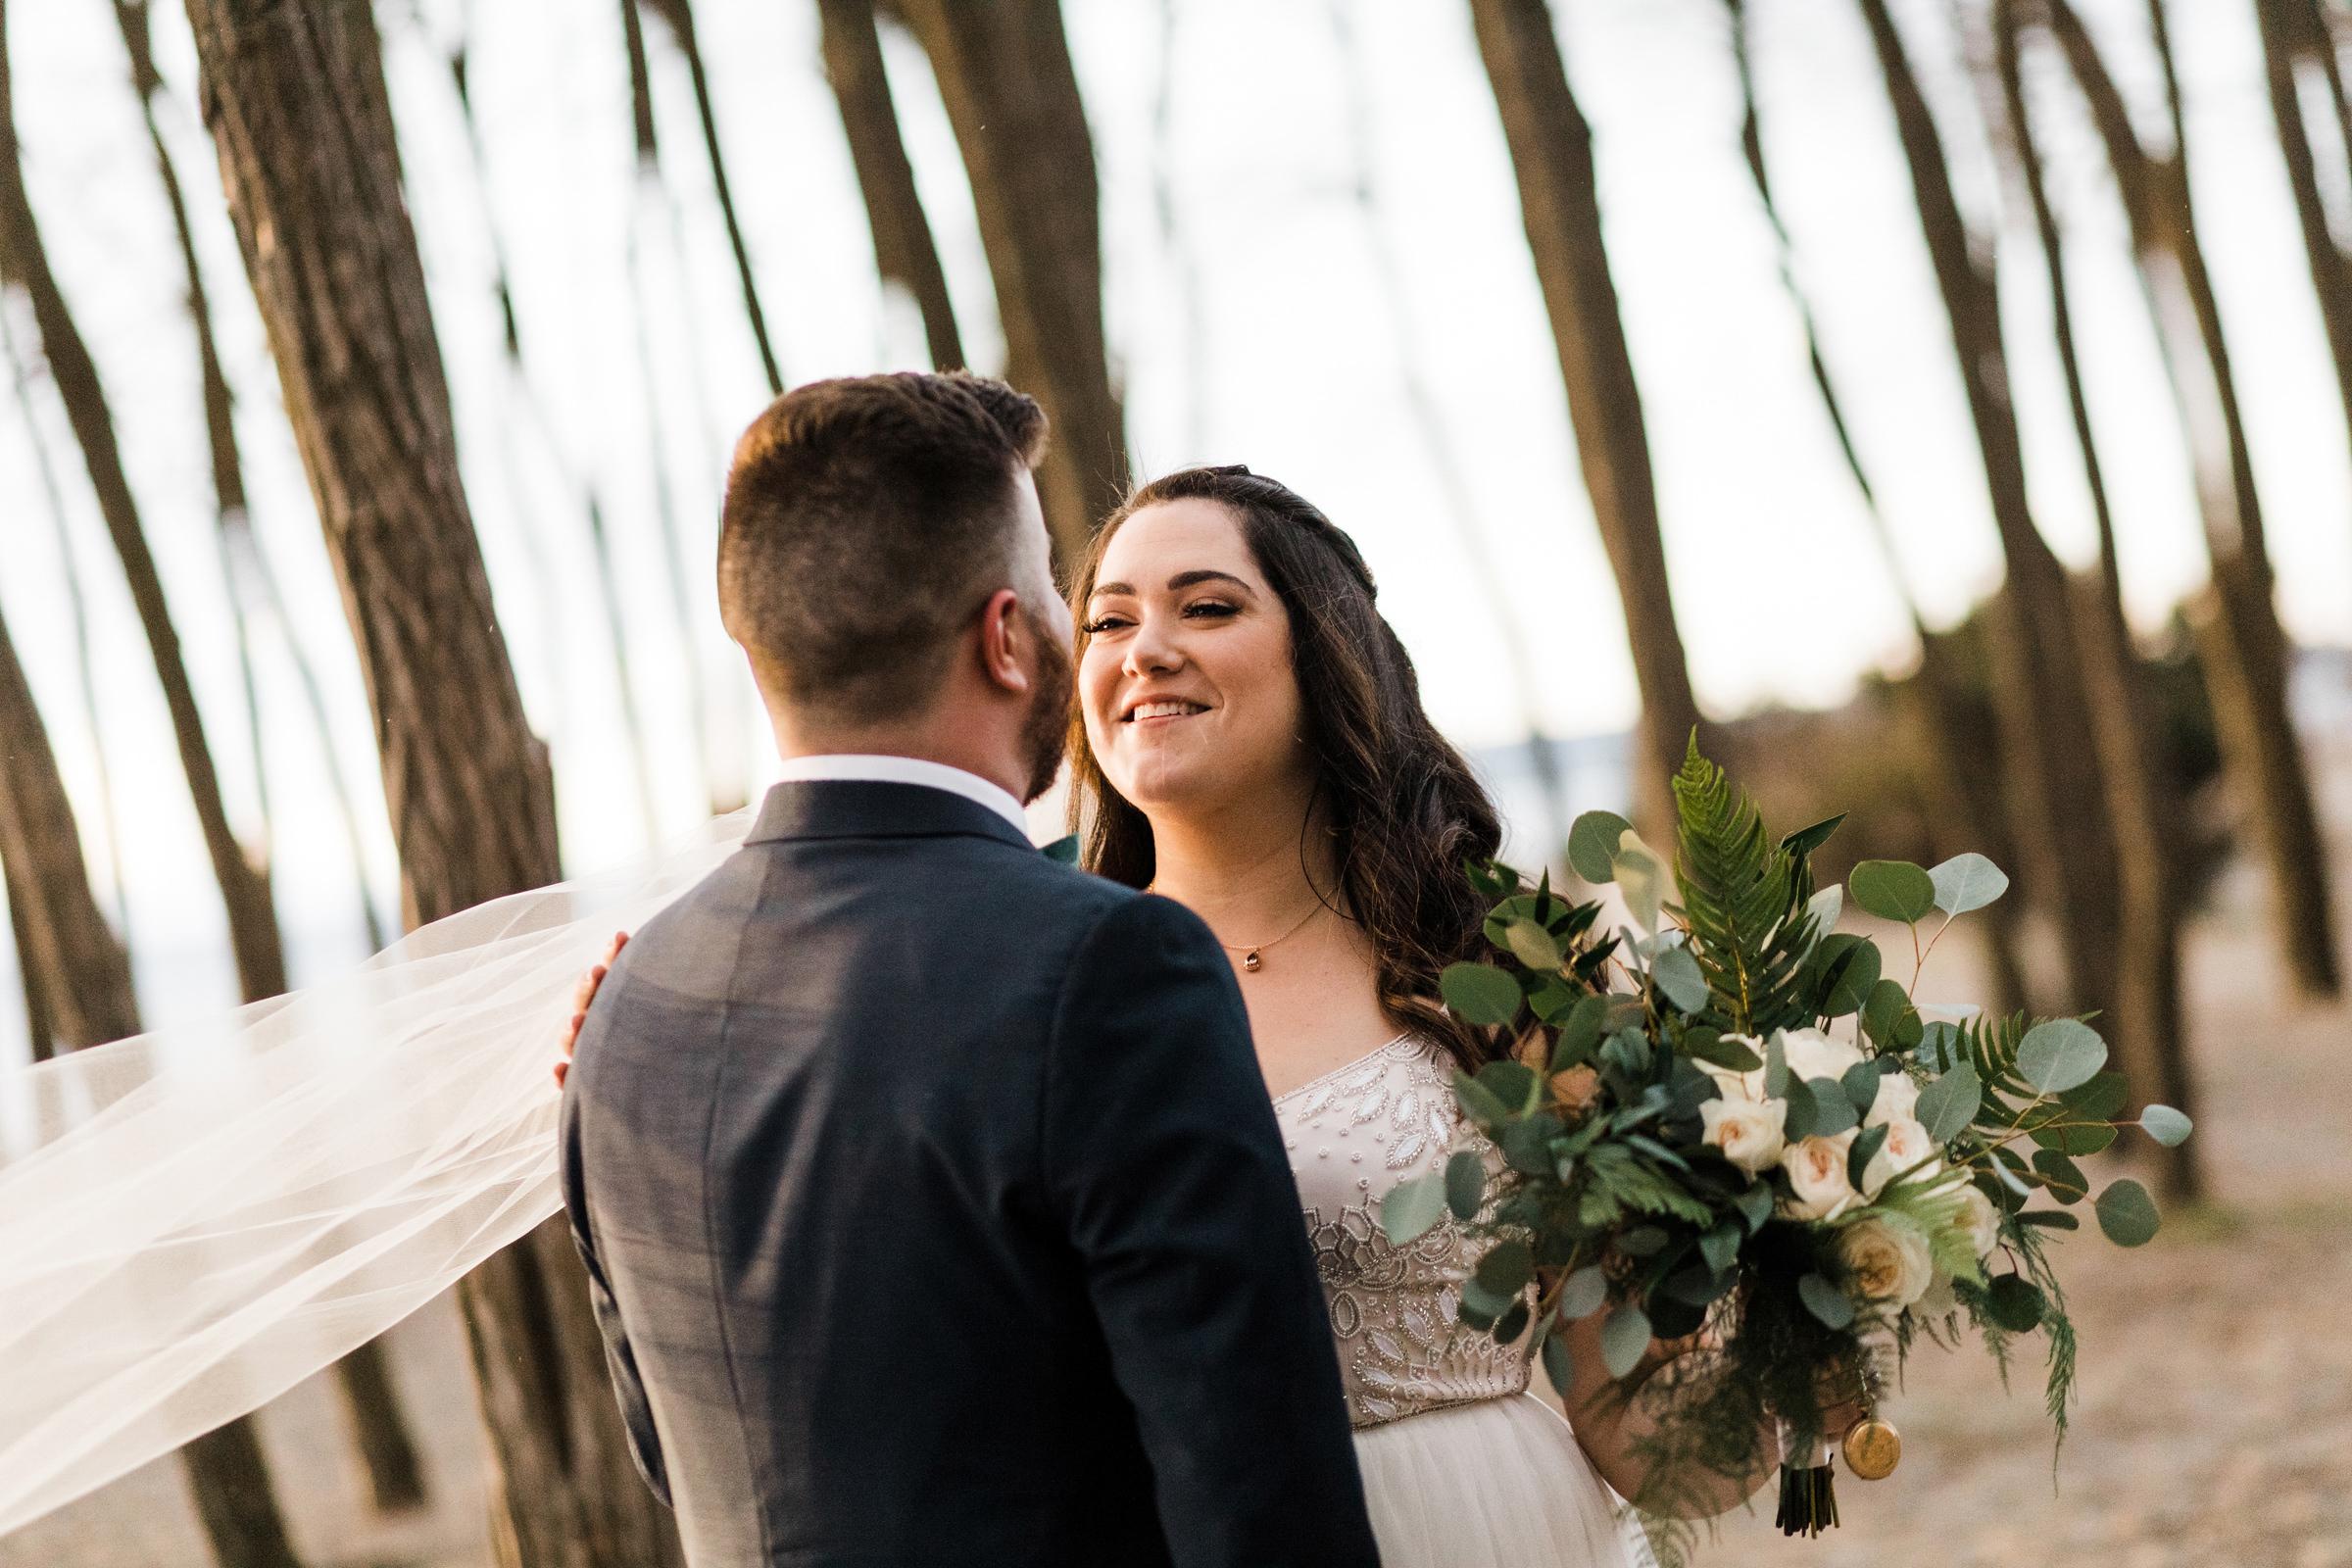 Wedding portrait at Golden Gardens Seattle - photo by Stephanie Cristalli Photography